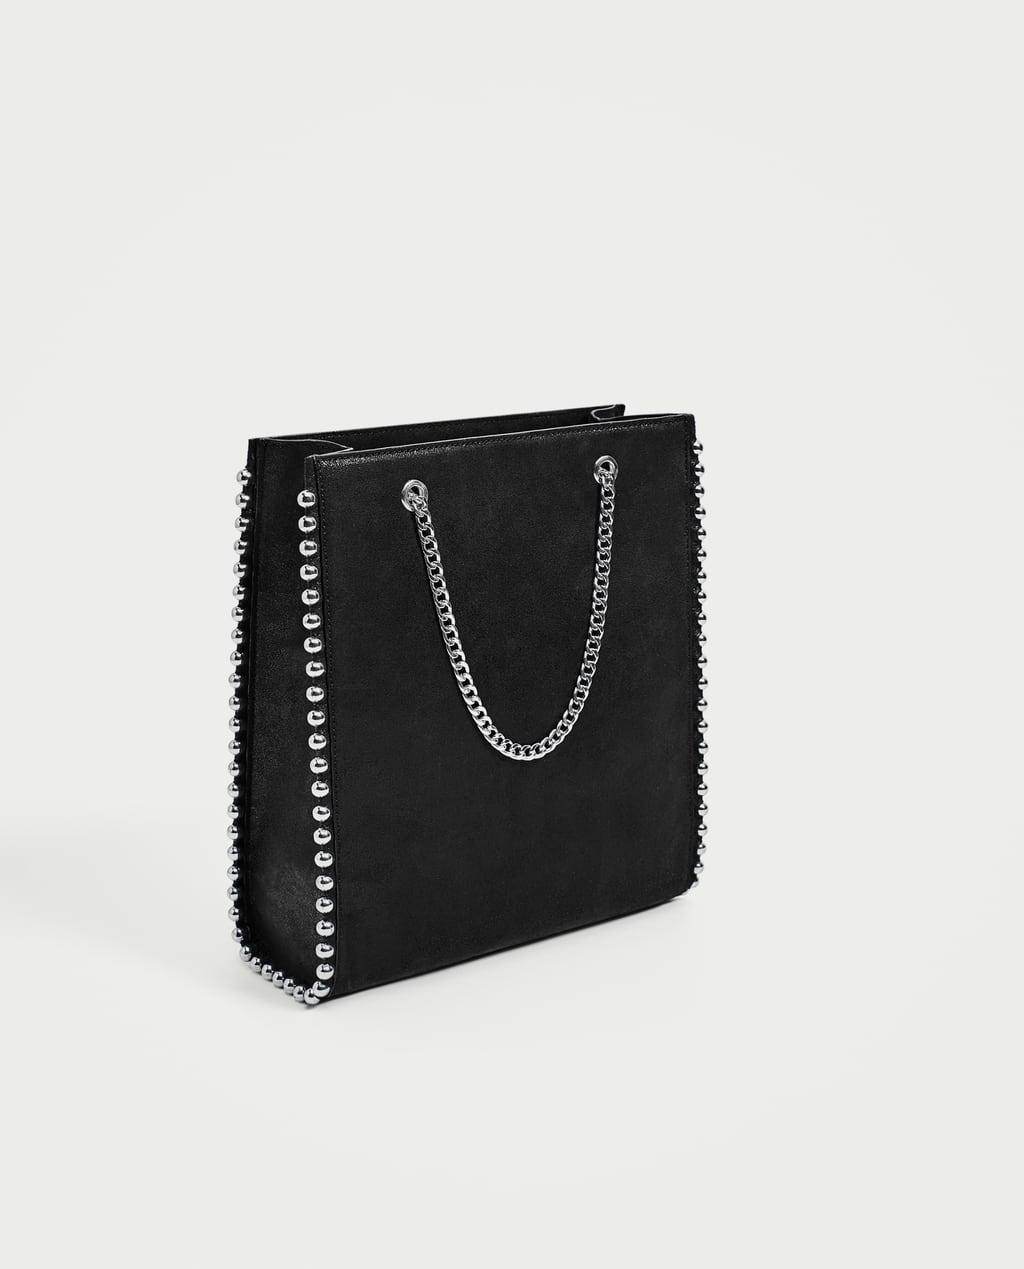 Mini leather tote bag zara - Image 1 Of Studded Tote Bag From Zara